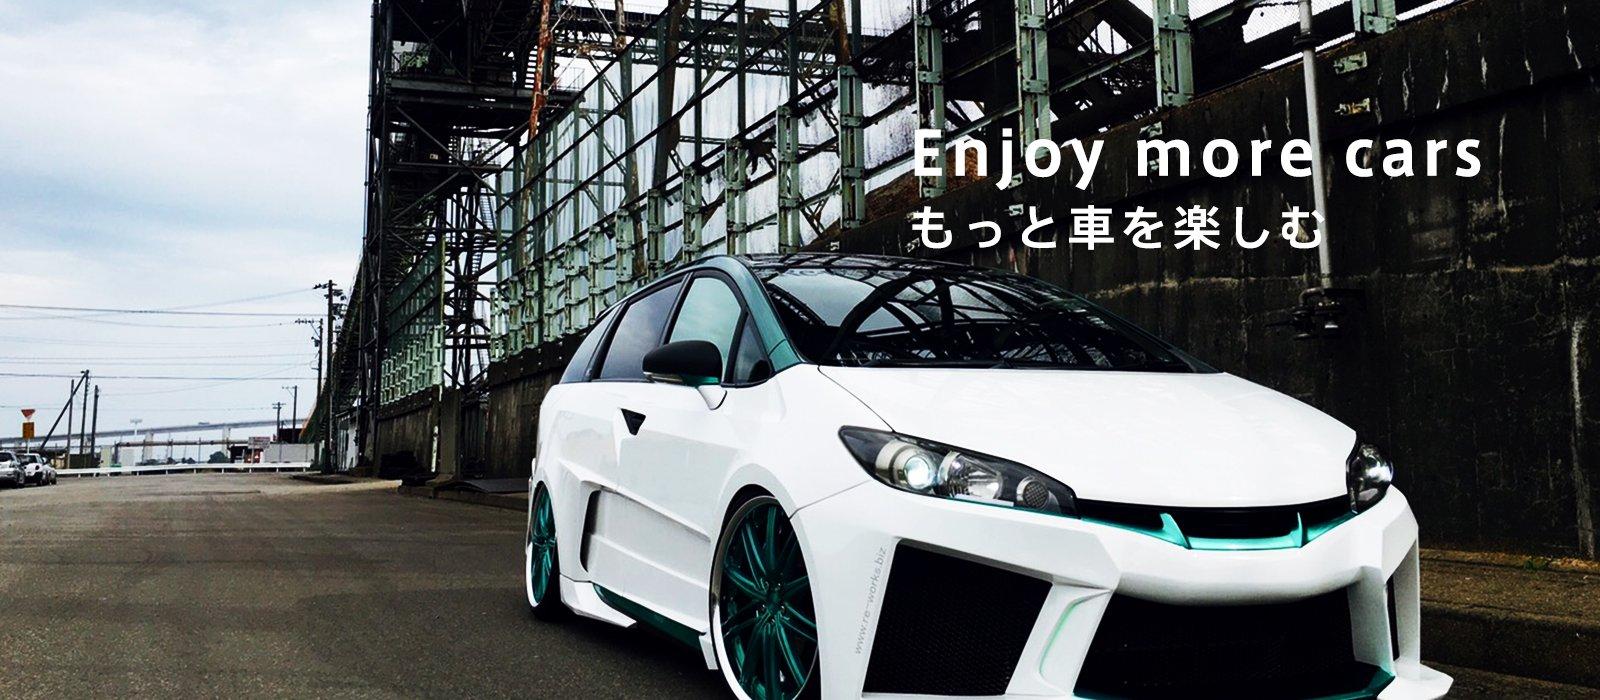 Enjoy more cars もっと車を楽しむ